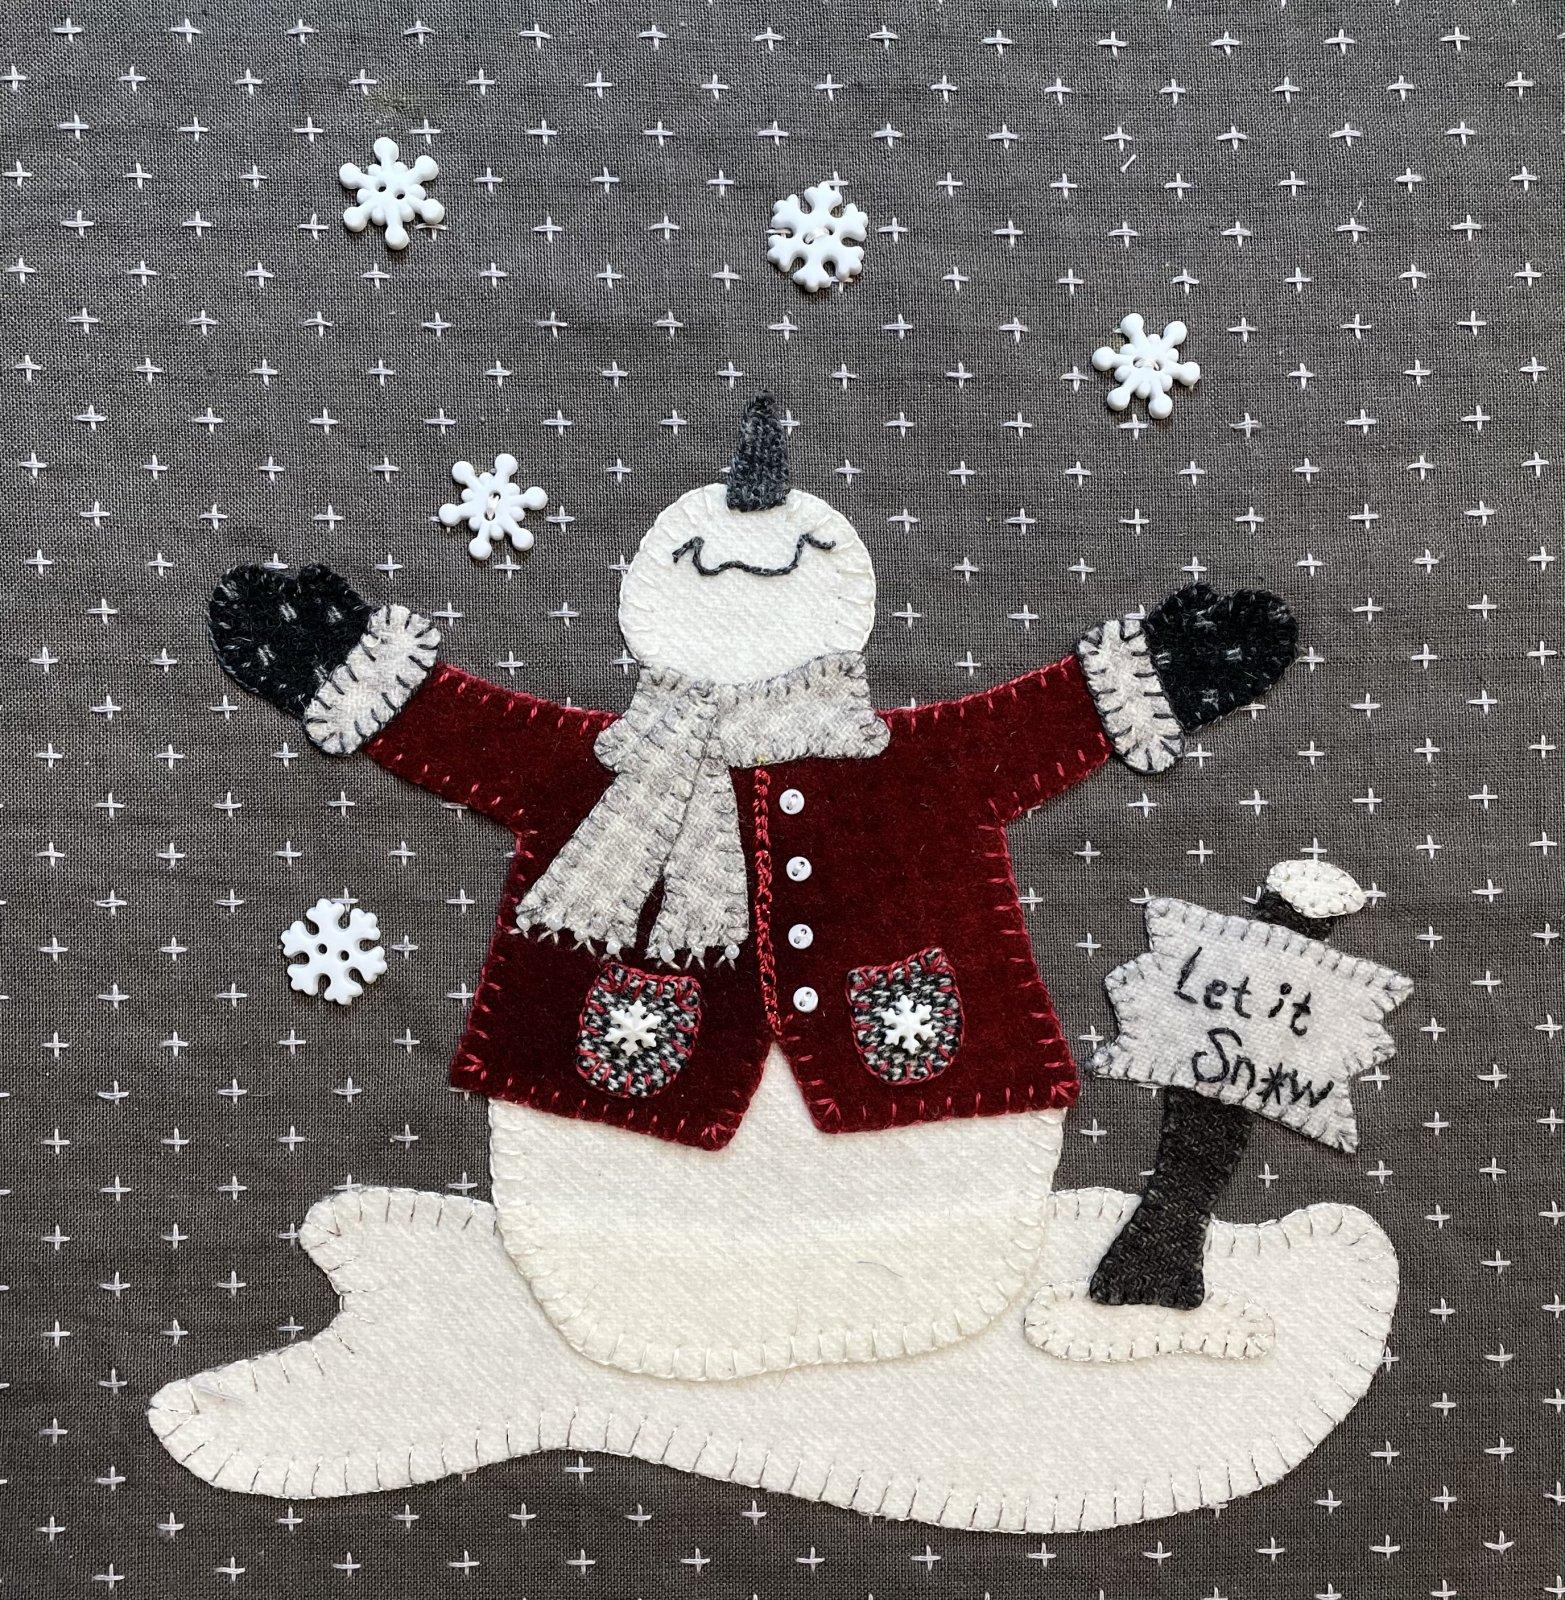 Snow Much Joy Block 2 FREE Digital Download Pattern